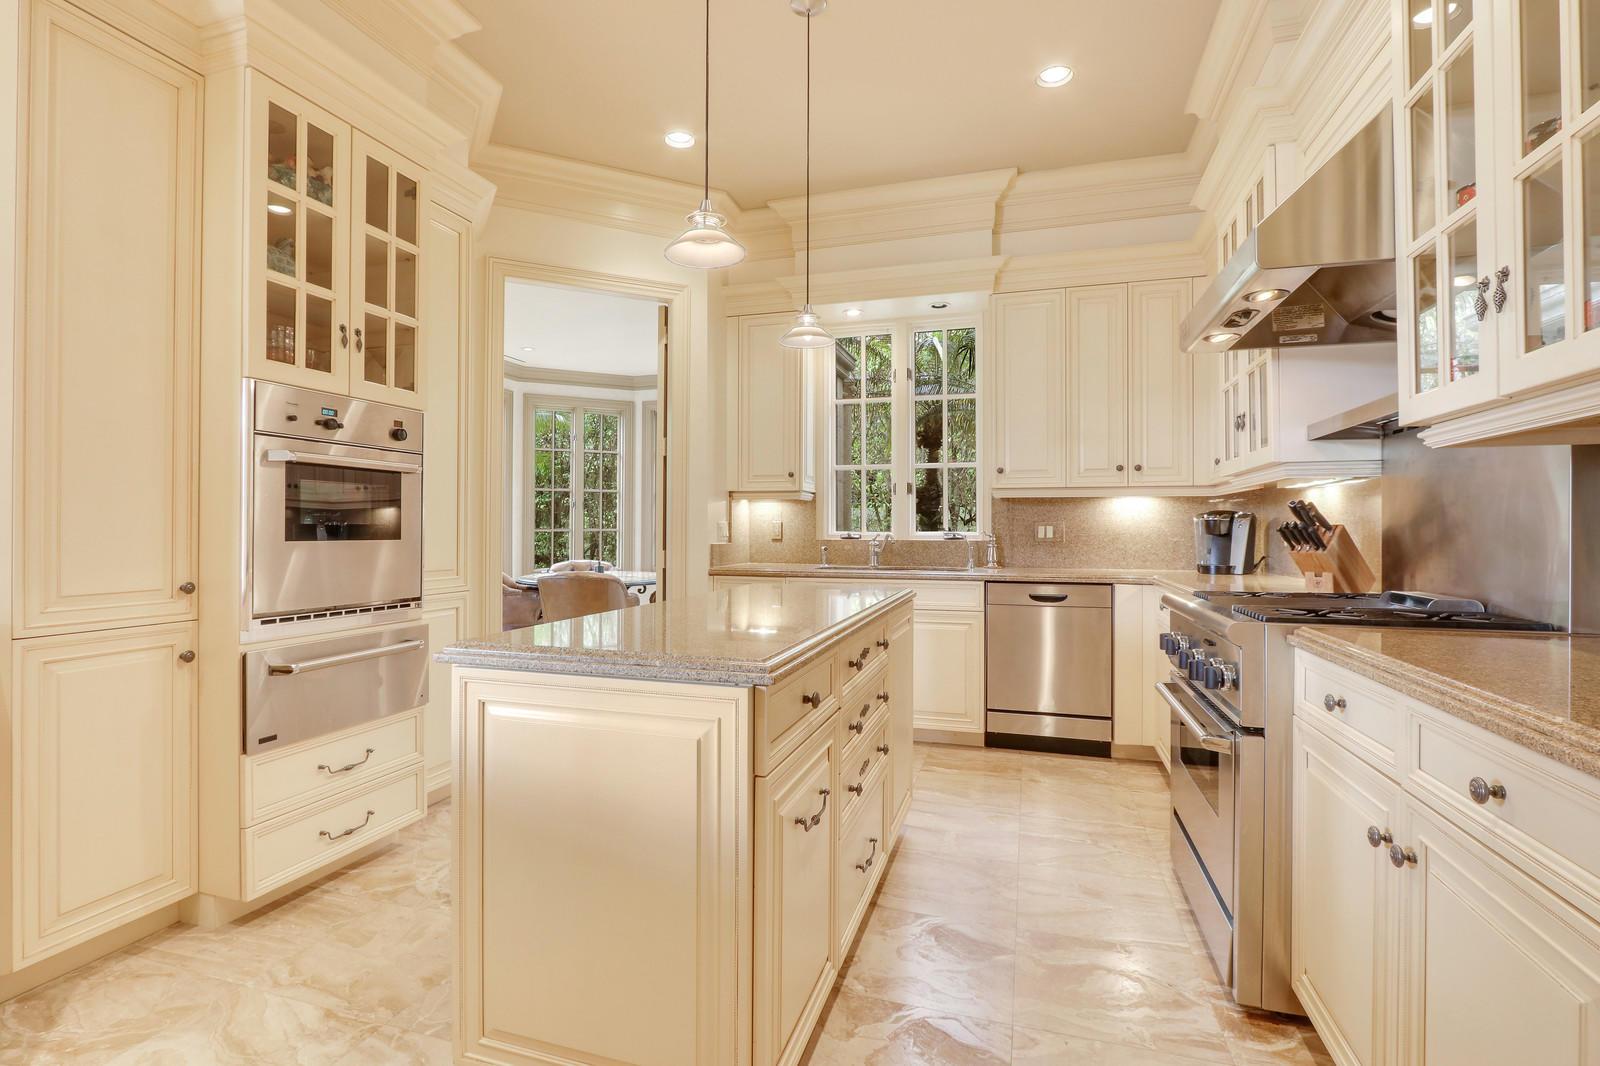 3140 Burgundy Drive, Palm Beach Gardens, Florida 33410, 6 Bedrooms Bedrooms, ,7 BathroomsBathrooms,A,Single family,Burgundy,RX-10491721